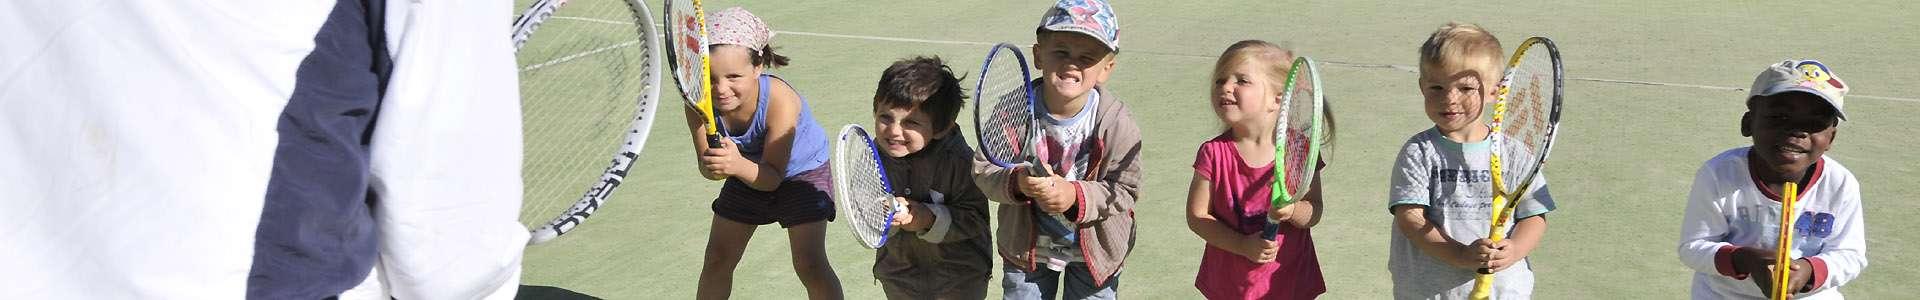 tennis-363